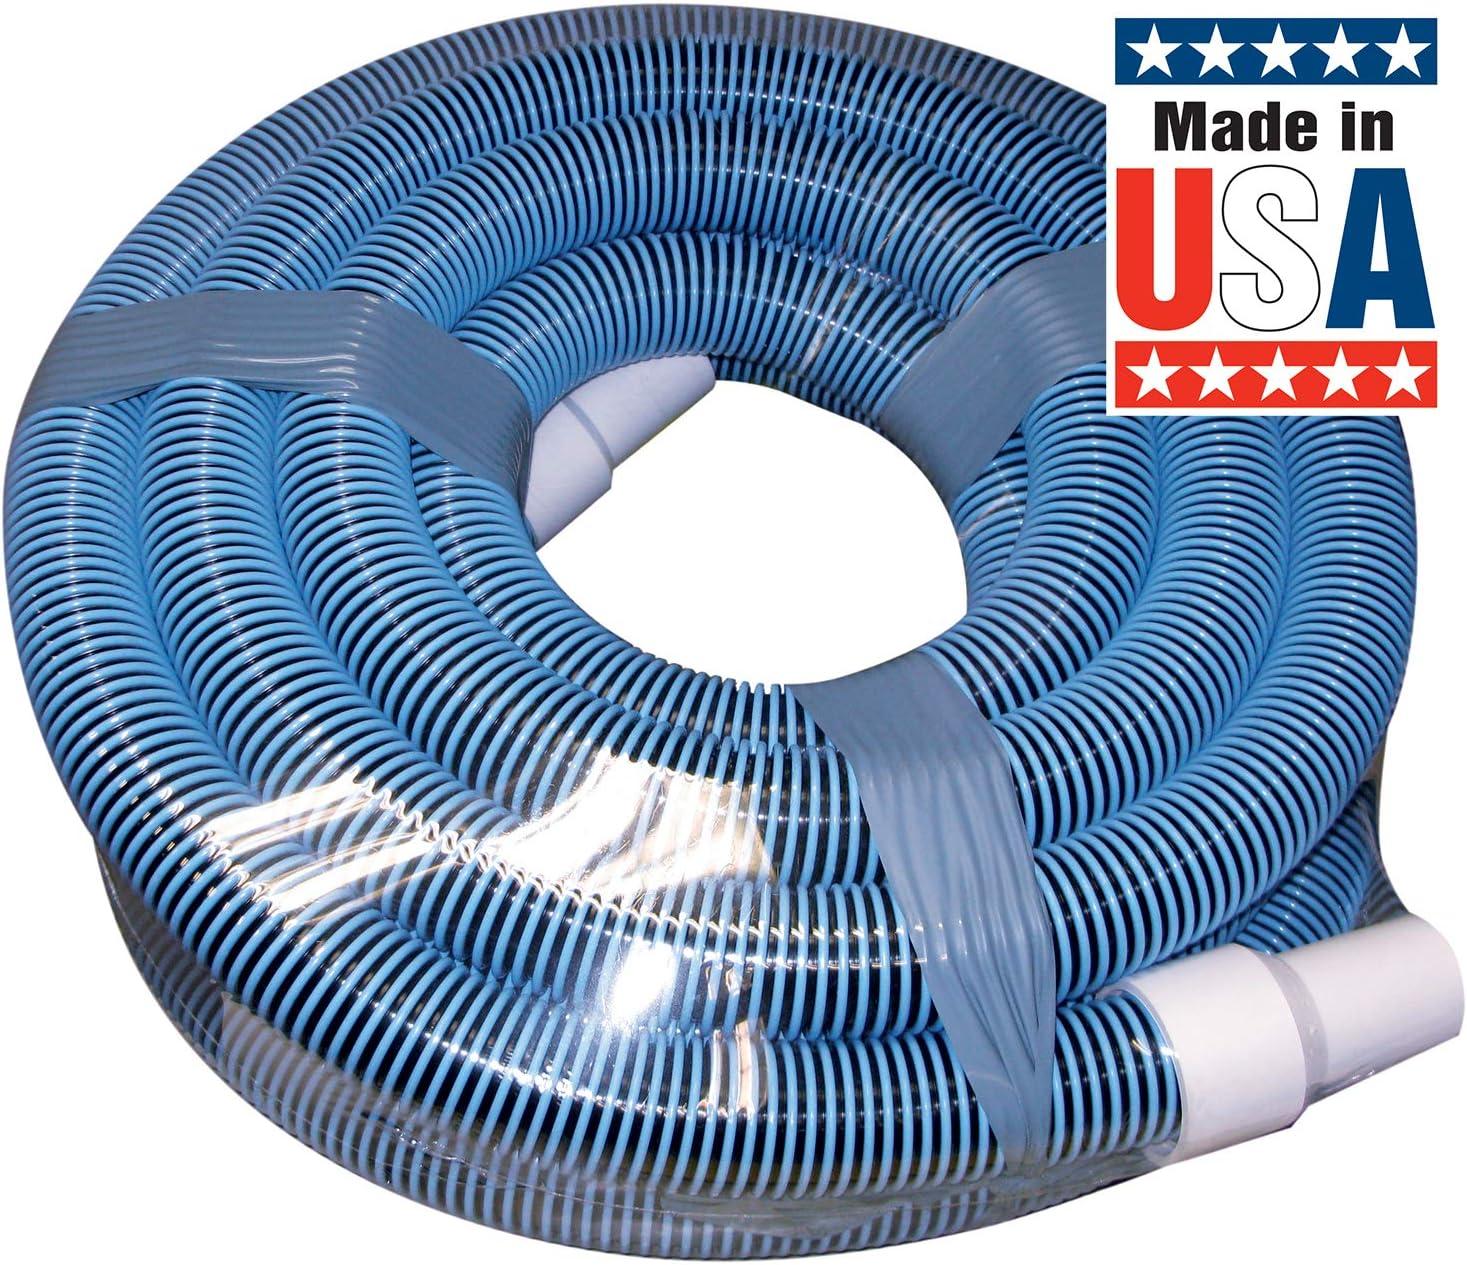 Poolmaster 33445 Heavy Duty In-Ground Pool Vacuum Hose With Swivel Cuff, 1-1/2-Inch by 45-Feet,Neutral